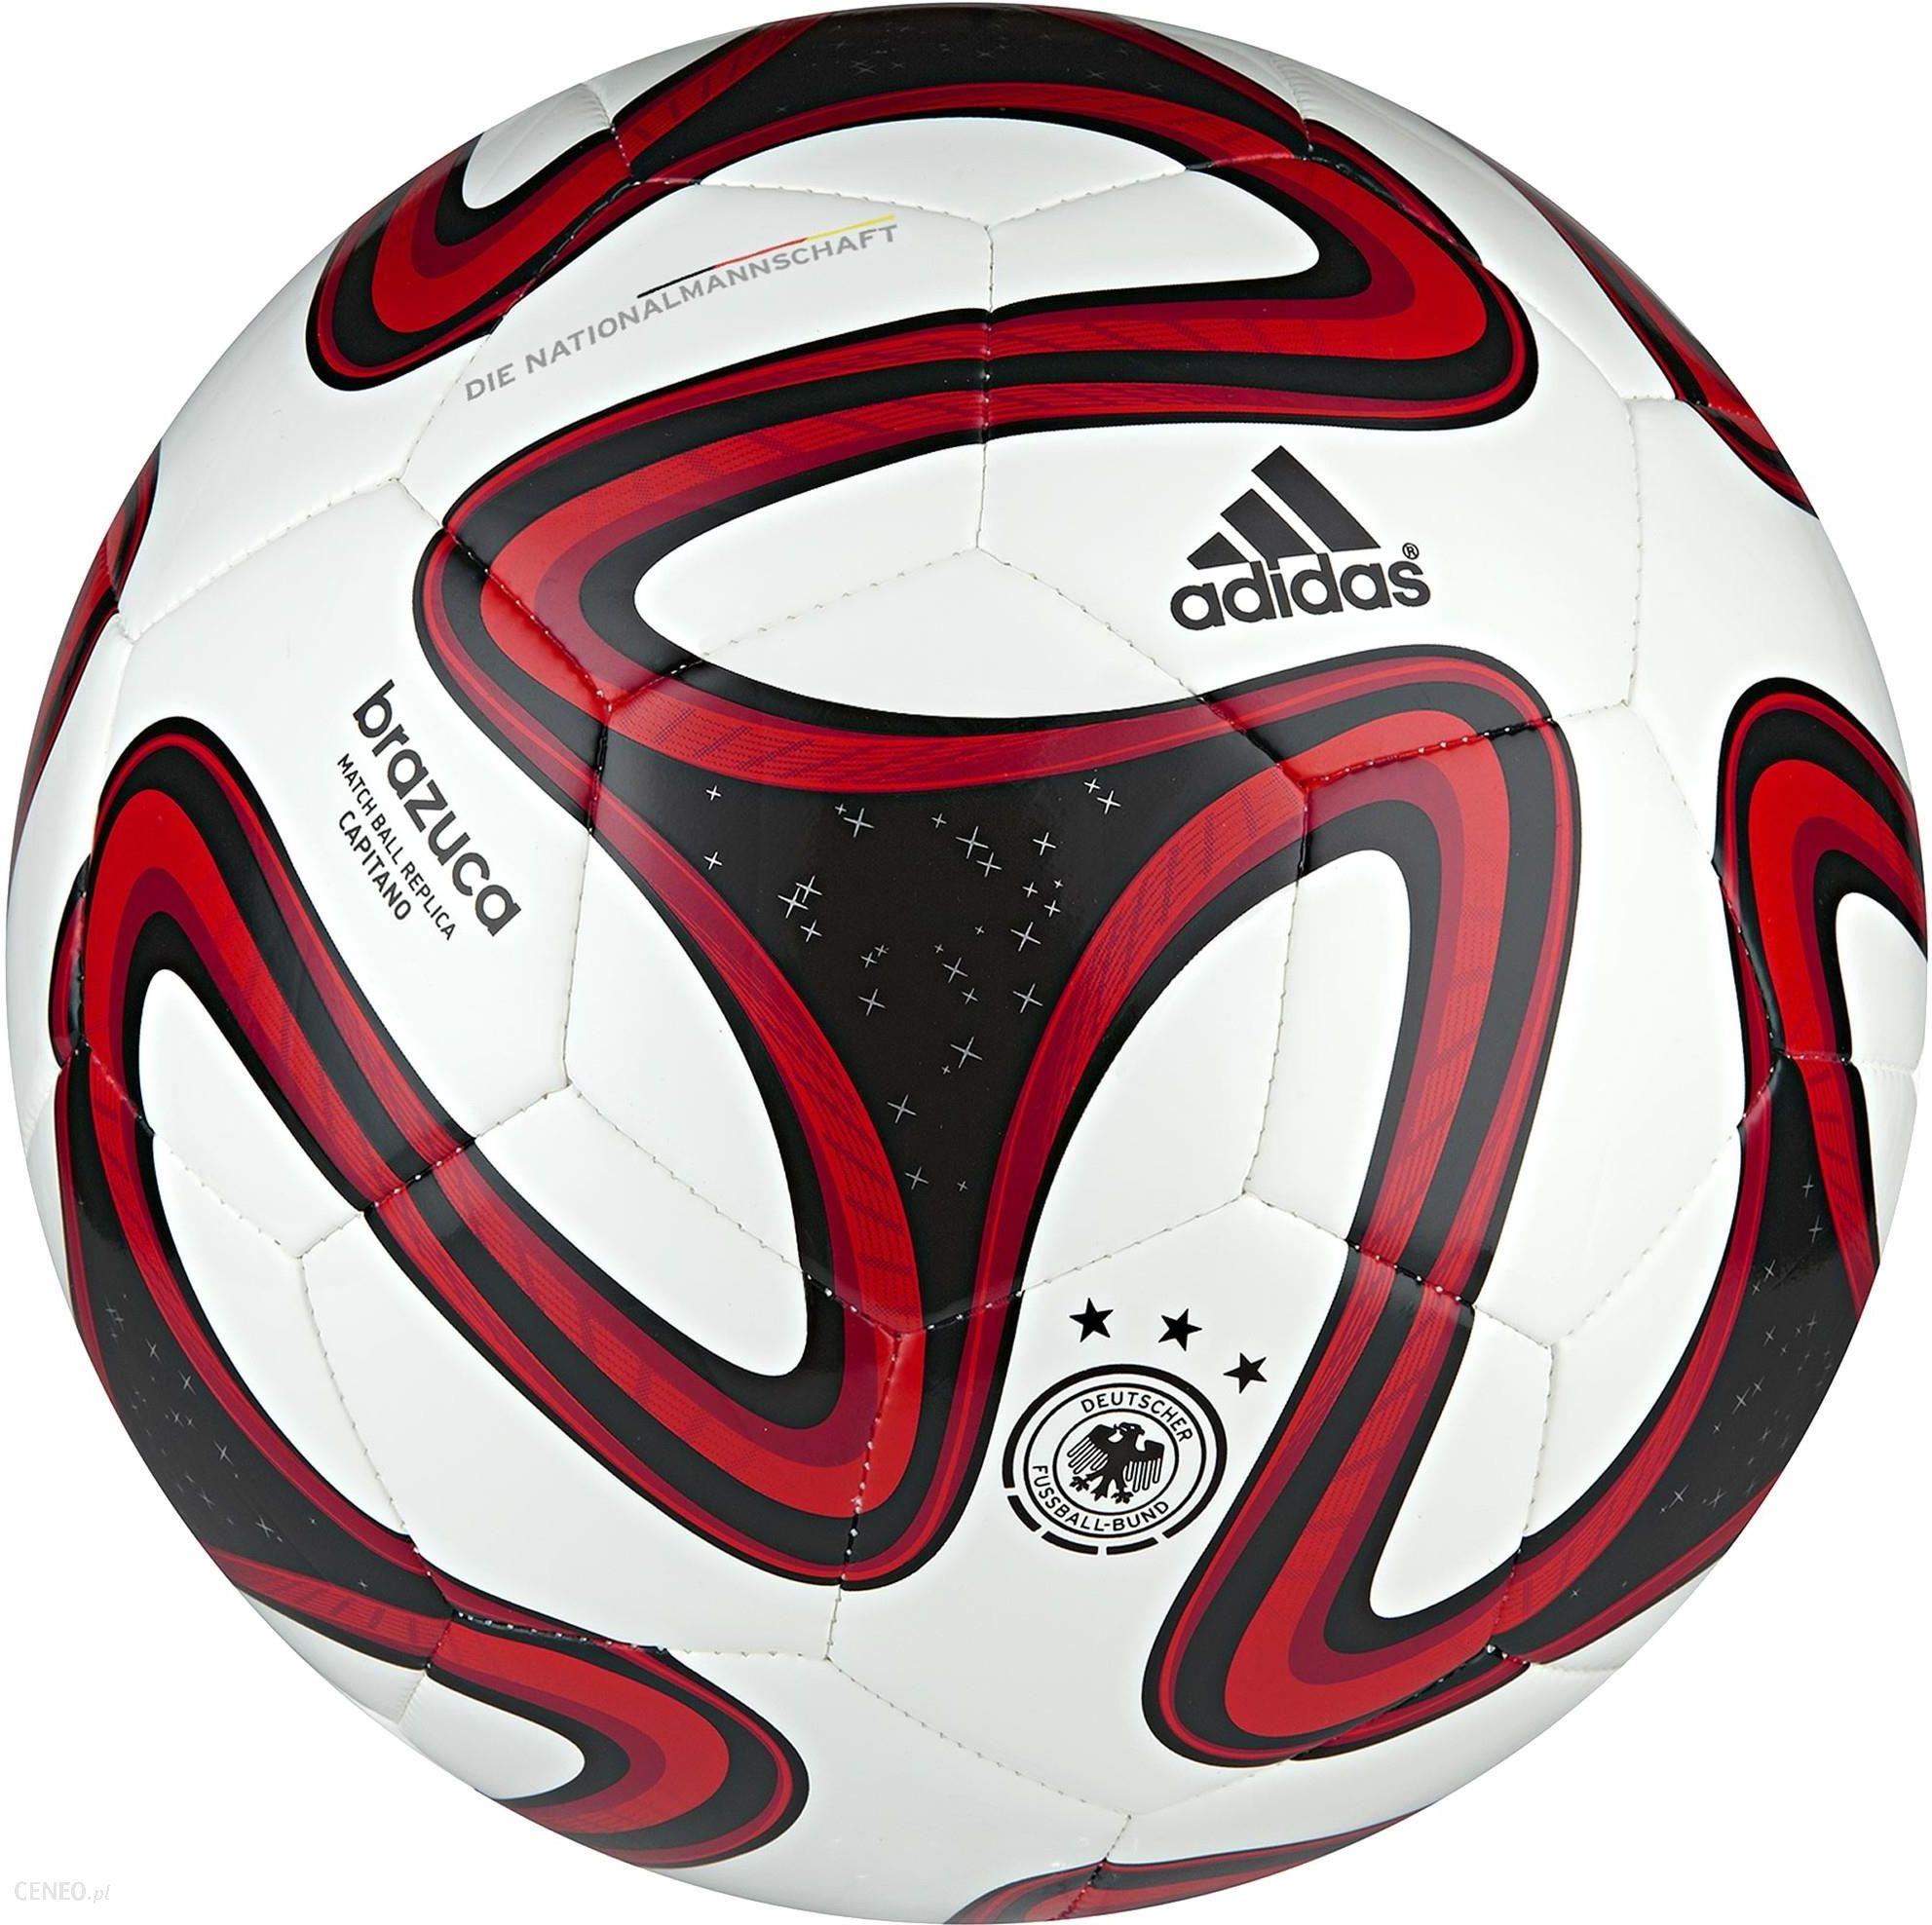 c4184d037a Adidas Bola Soccer Manchester United Finale Ap0400 Spec dan Daftar Source ·  Y kle 400x300 adidas